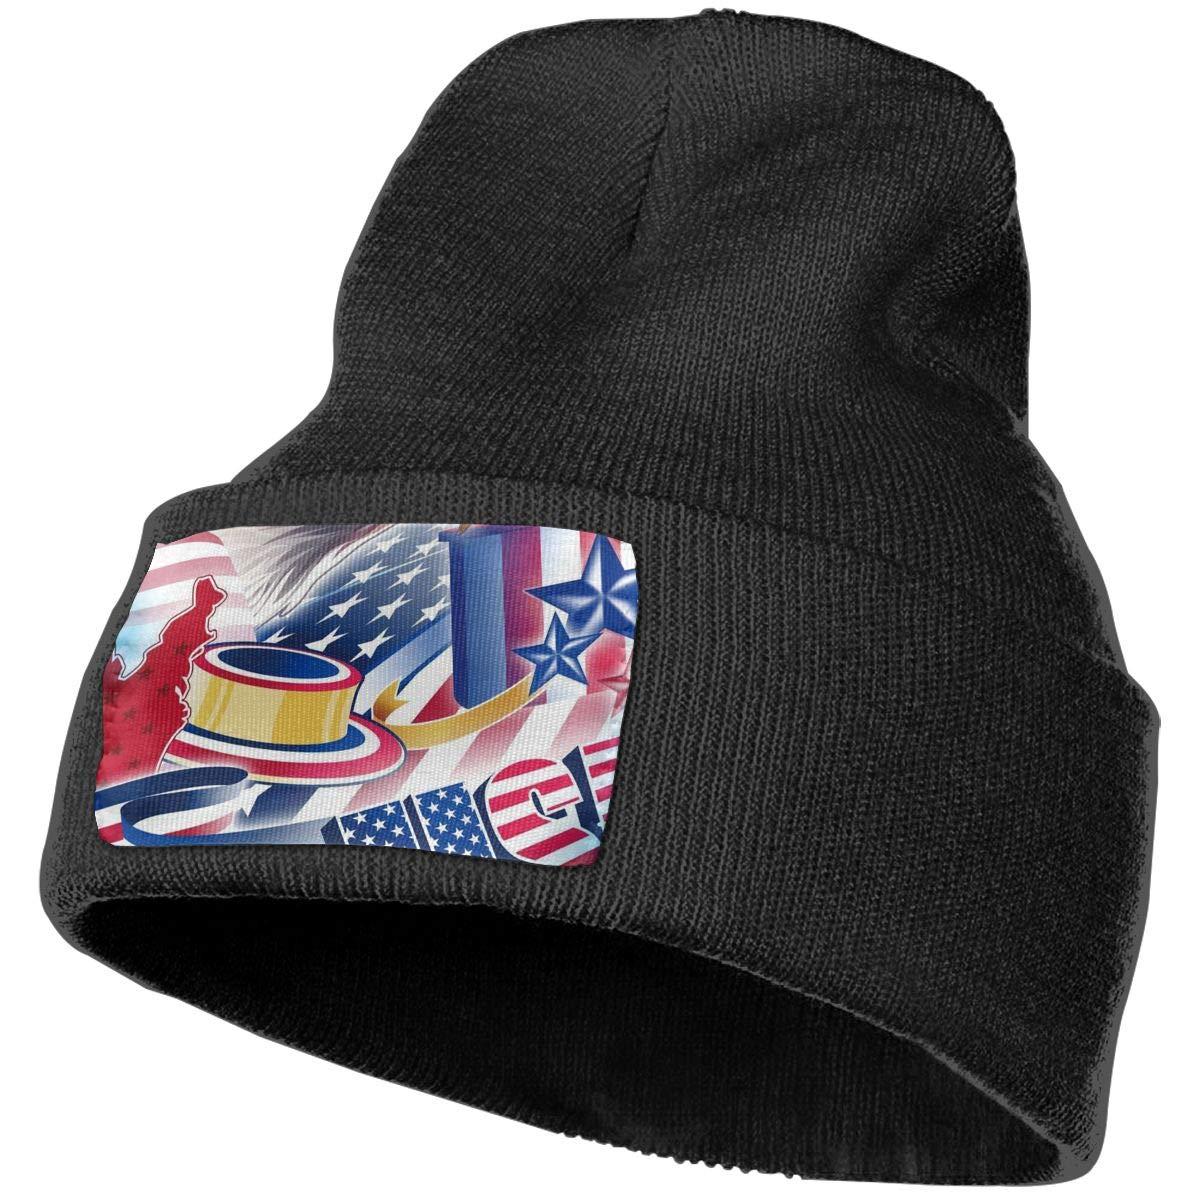 a6282ddb11d60 Amazon.com  Eagle American Flag Winter Beanie Hat Soft   Warm Chunky Skull  Wool Knit Hats Cap for Men Women  Clothing